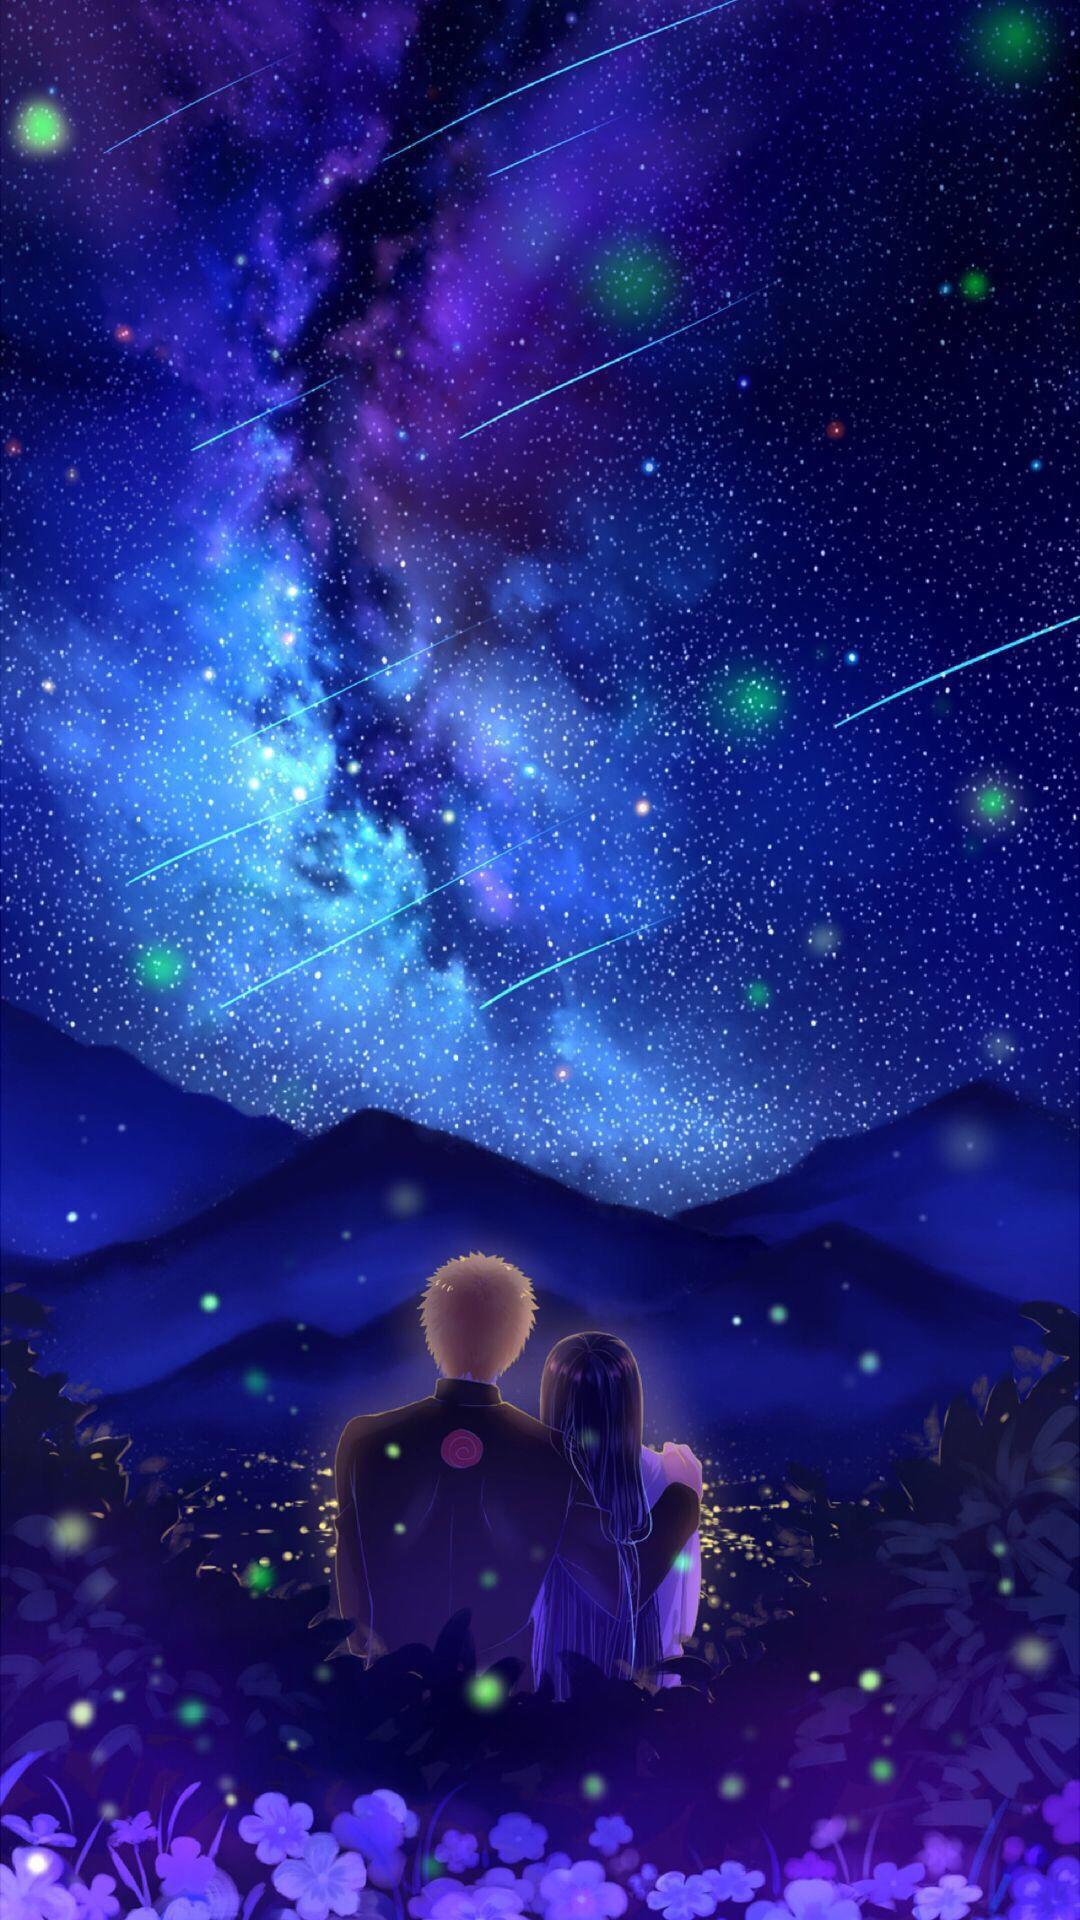 Pin By Ilittlation On Anime Games Digital Fantasy Art Anime Wallpaper Anime Scenery Anime Art